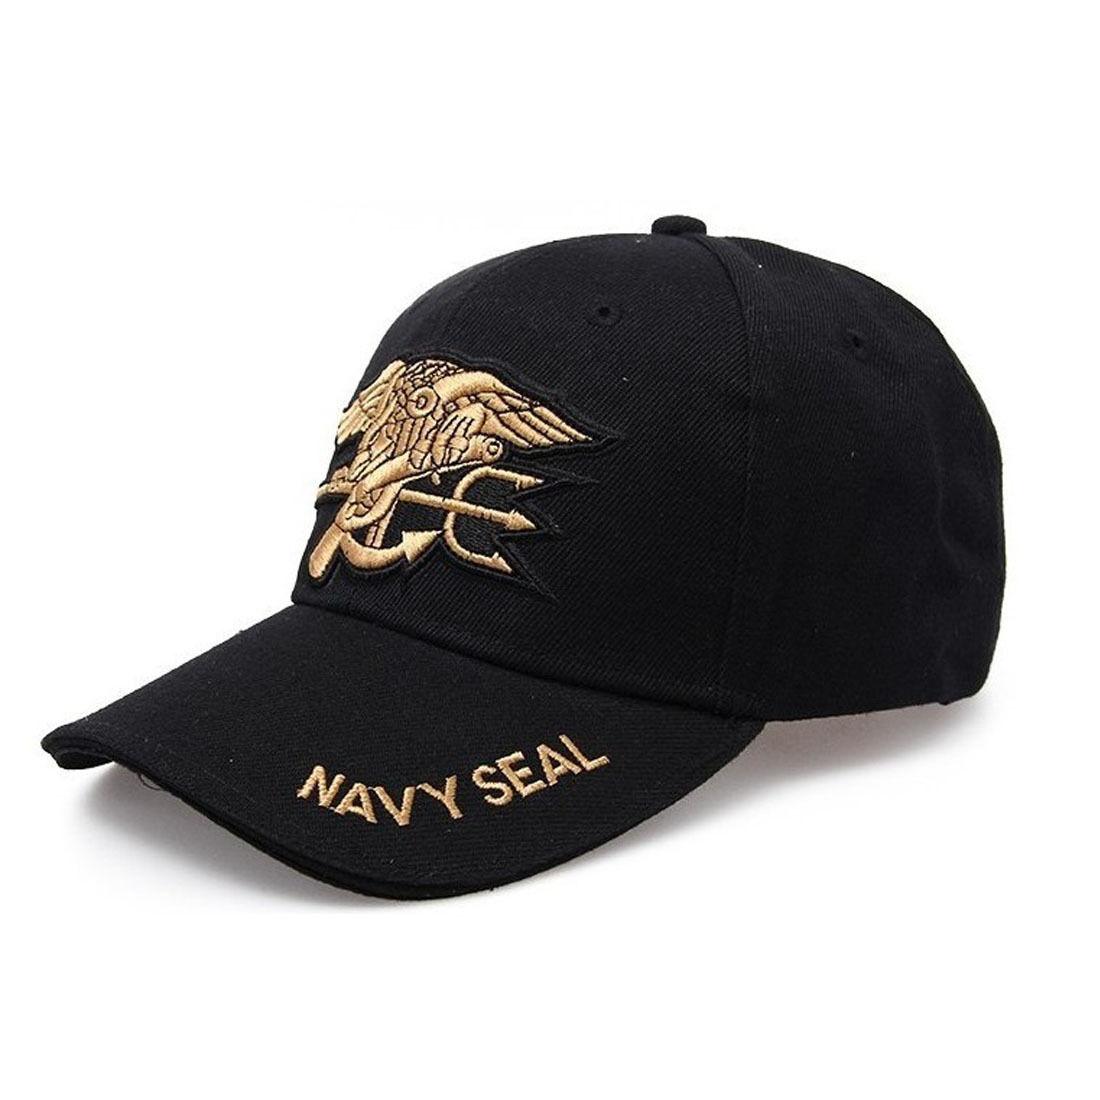 Black Outdoor Sport Tactical Military Hunting Navy Seal Baseball Cap Hat